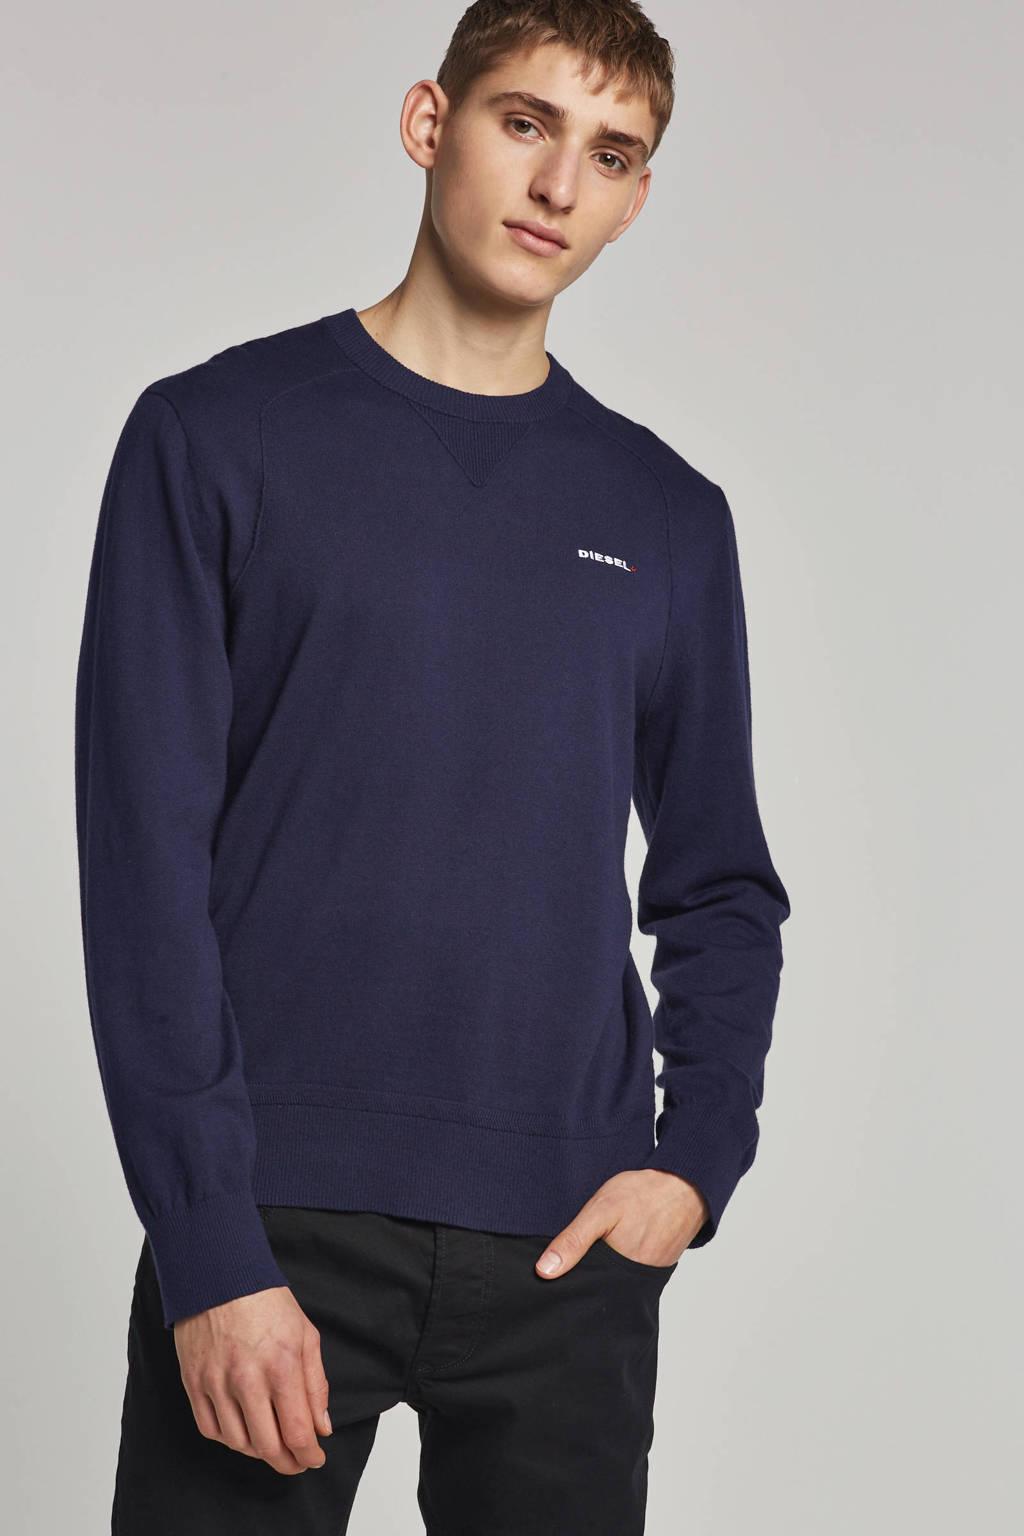 Diesel trui, Donkerblauw